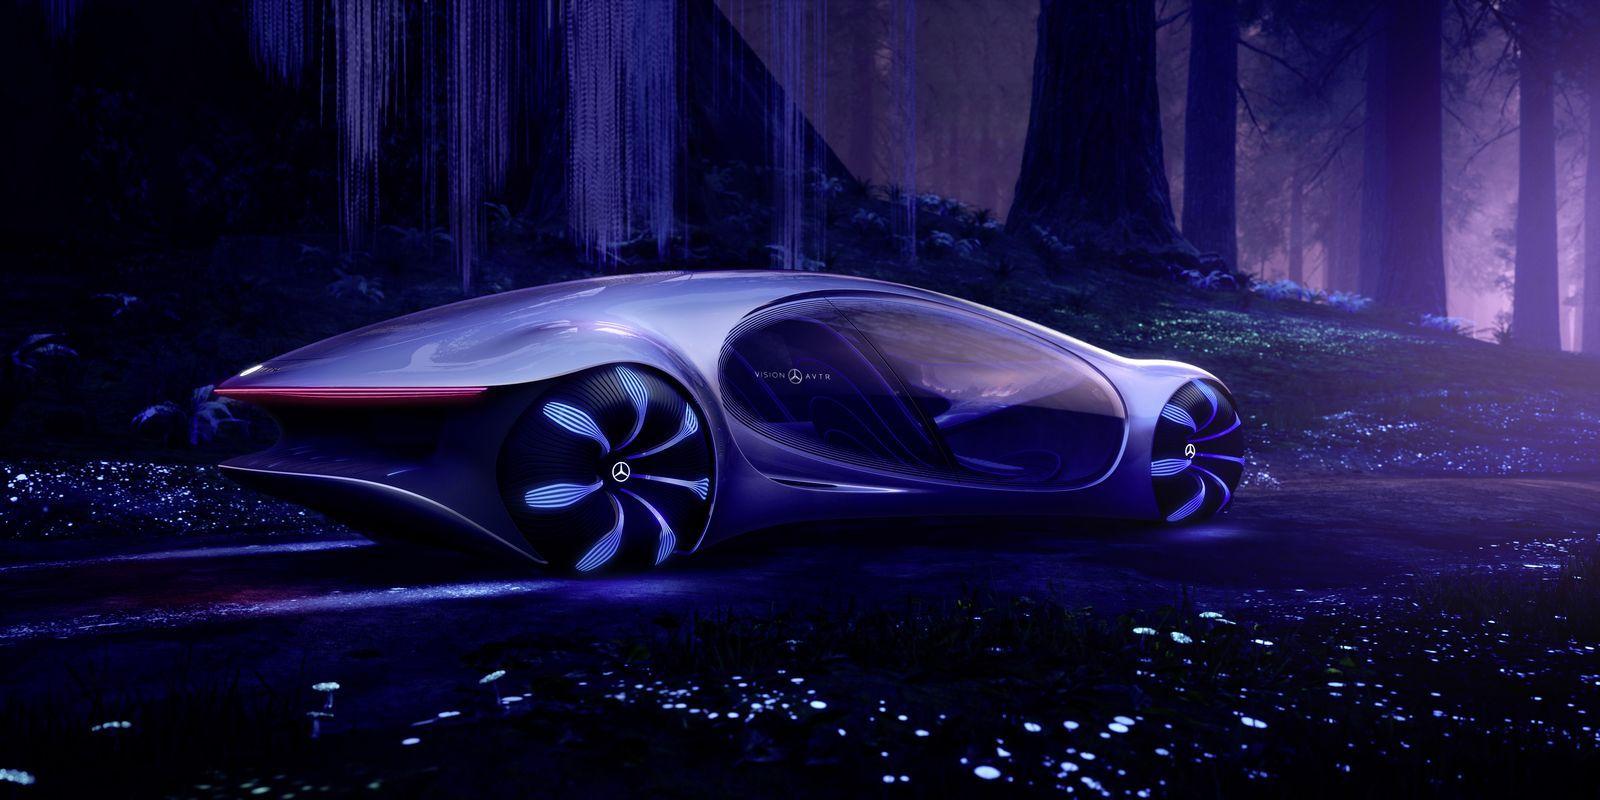 MercedesBenzVisionAVTR_2021_15